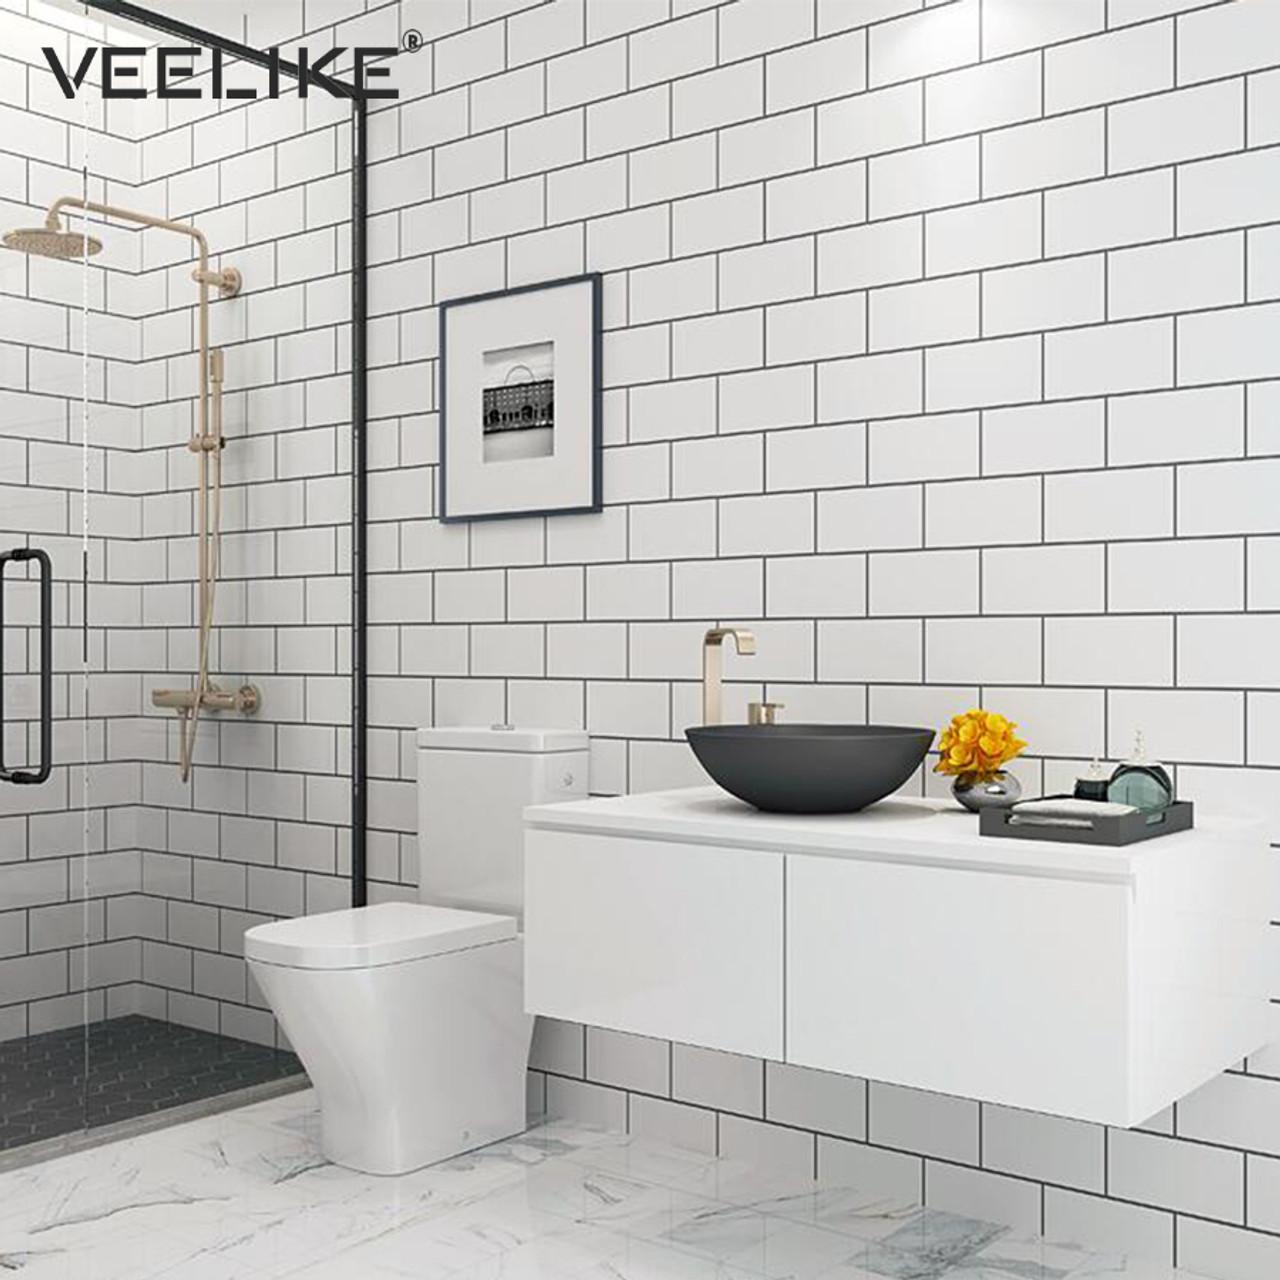 waterproof diy pvc vinyl self adhesive wallpaper for kitchen backsplash tile bathroom living room bedroom home decor wall paper